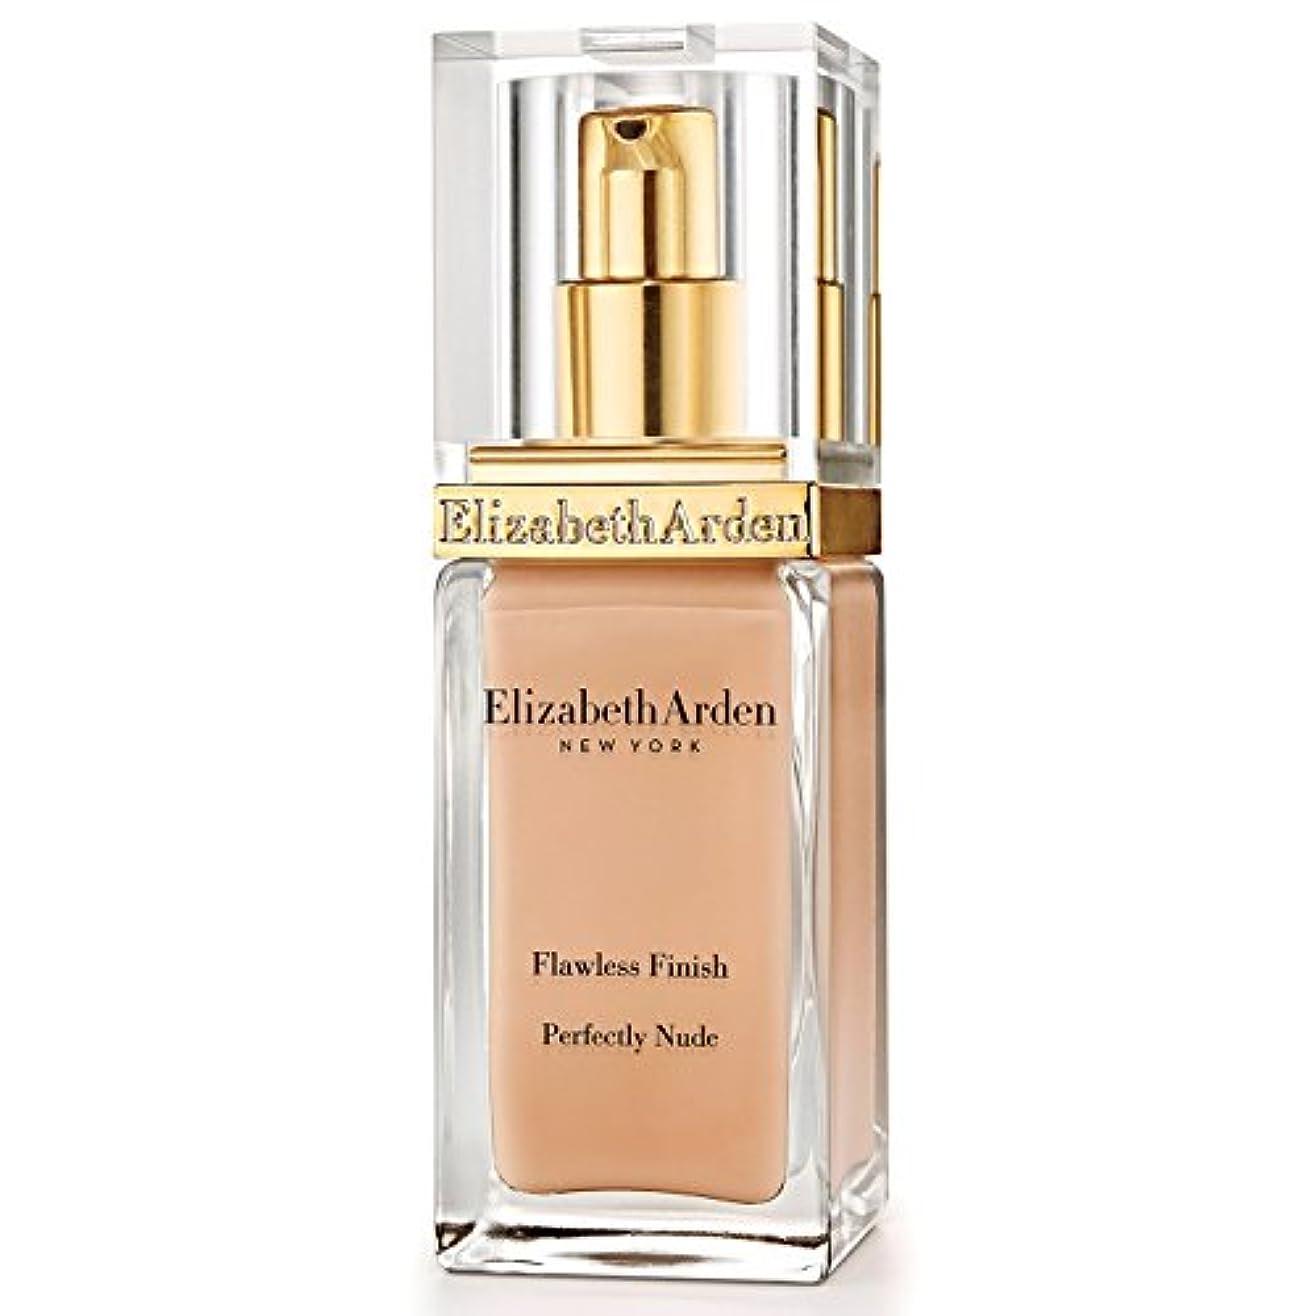 Elizabeth Arden Flawless Finish Perfectly Nude Foundation SPF 15 Cameo - エリザベスアーデン完璧な仕上がり完璧ヌードファンデーション 15カメオ [...